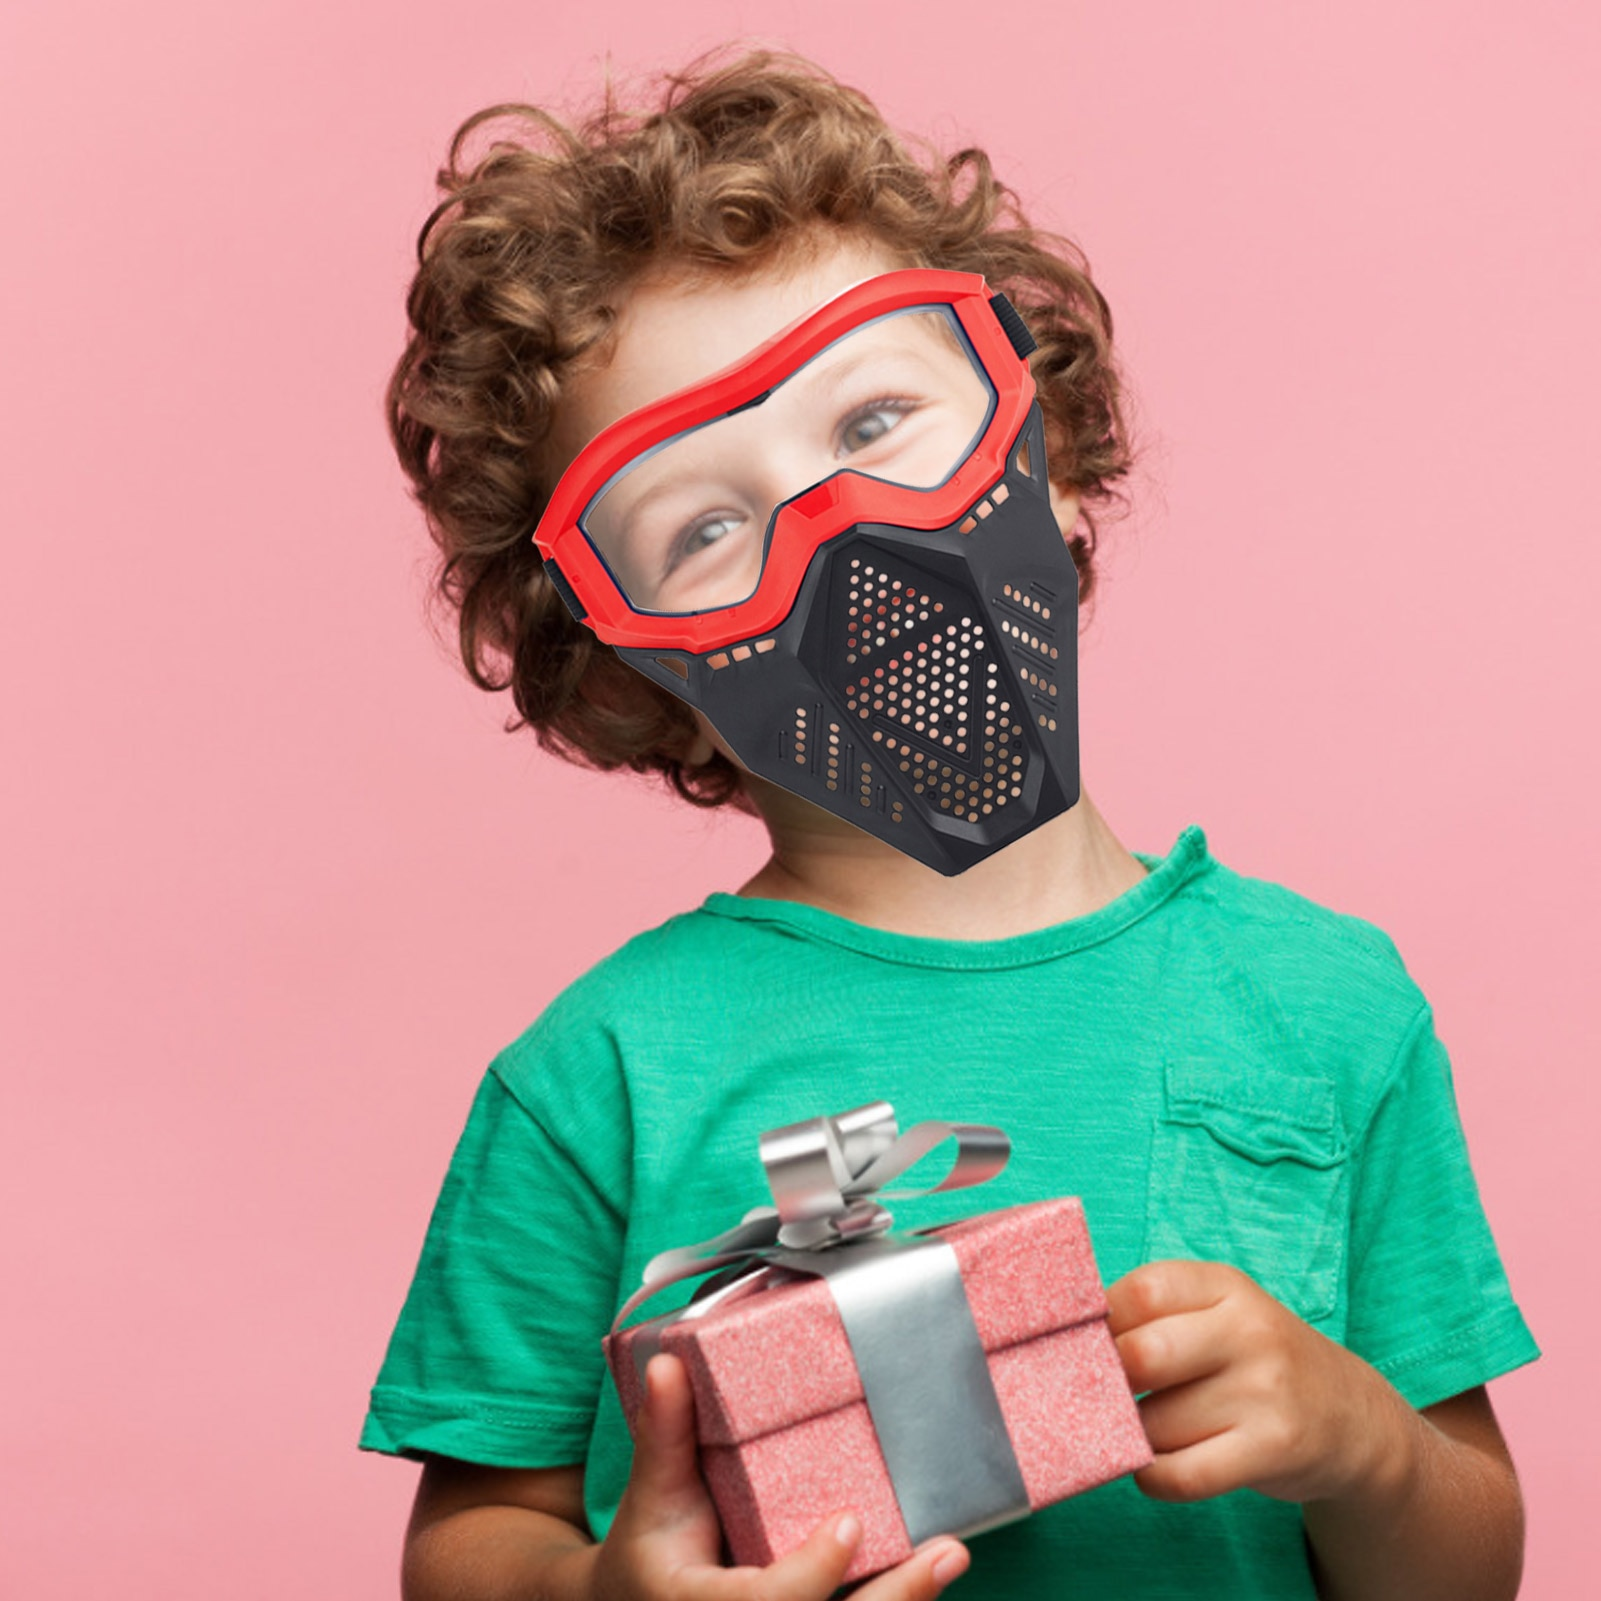 Explosive Soft Bullet Mask Children's Shooting Game Protective Equipment Toy Soft Bullet Gun Battle Mask